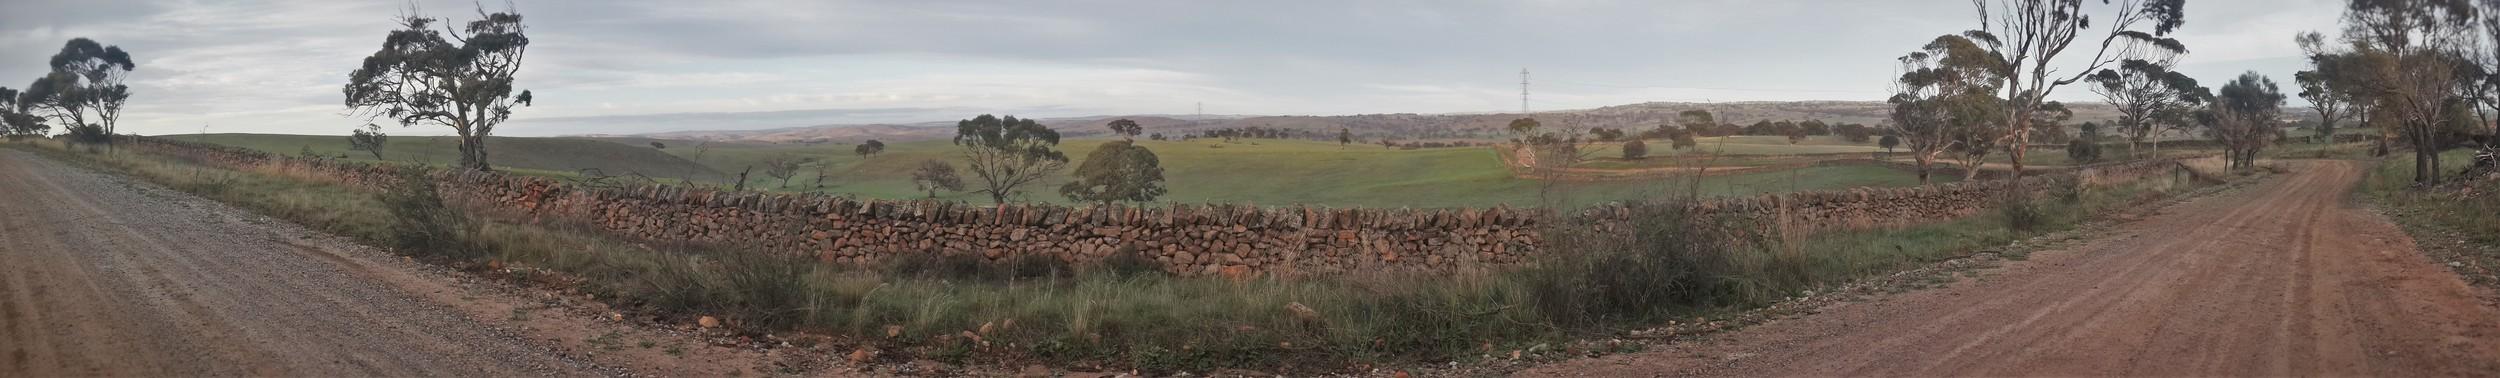 Historic Dry Stone Walls, Pine Hut Rd, Keyneton - Eden Valley - Sedan, South Australia